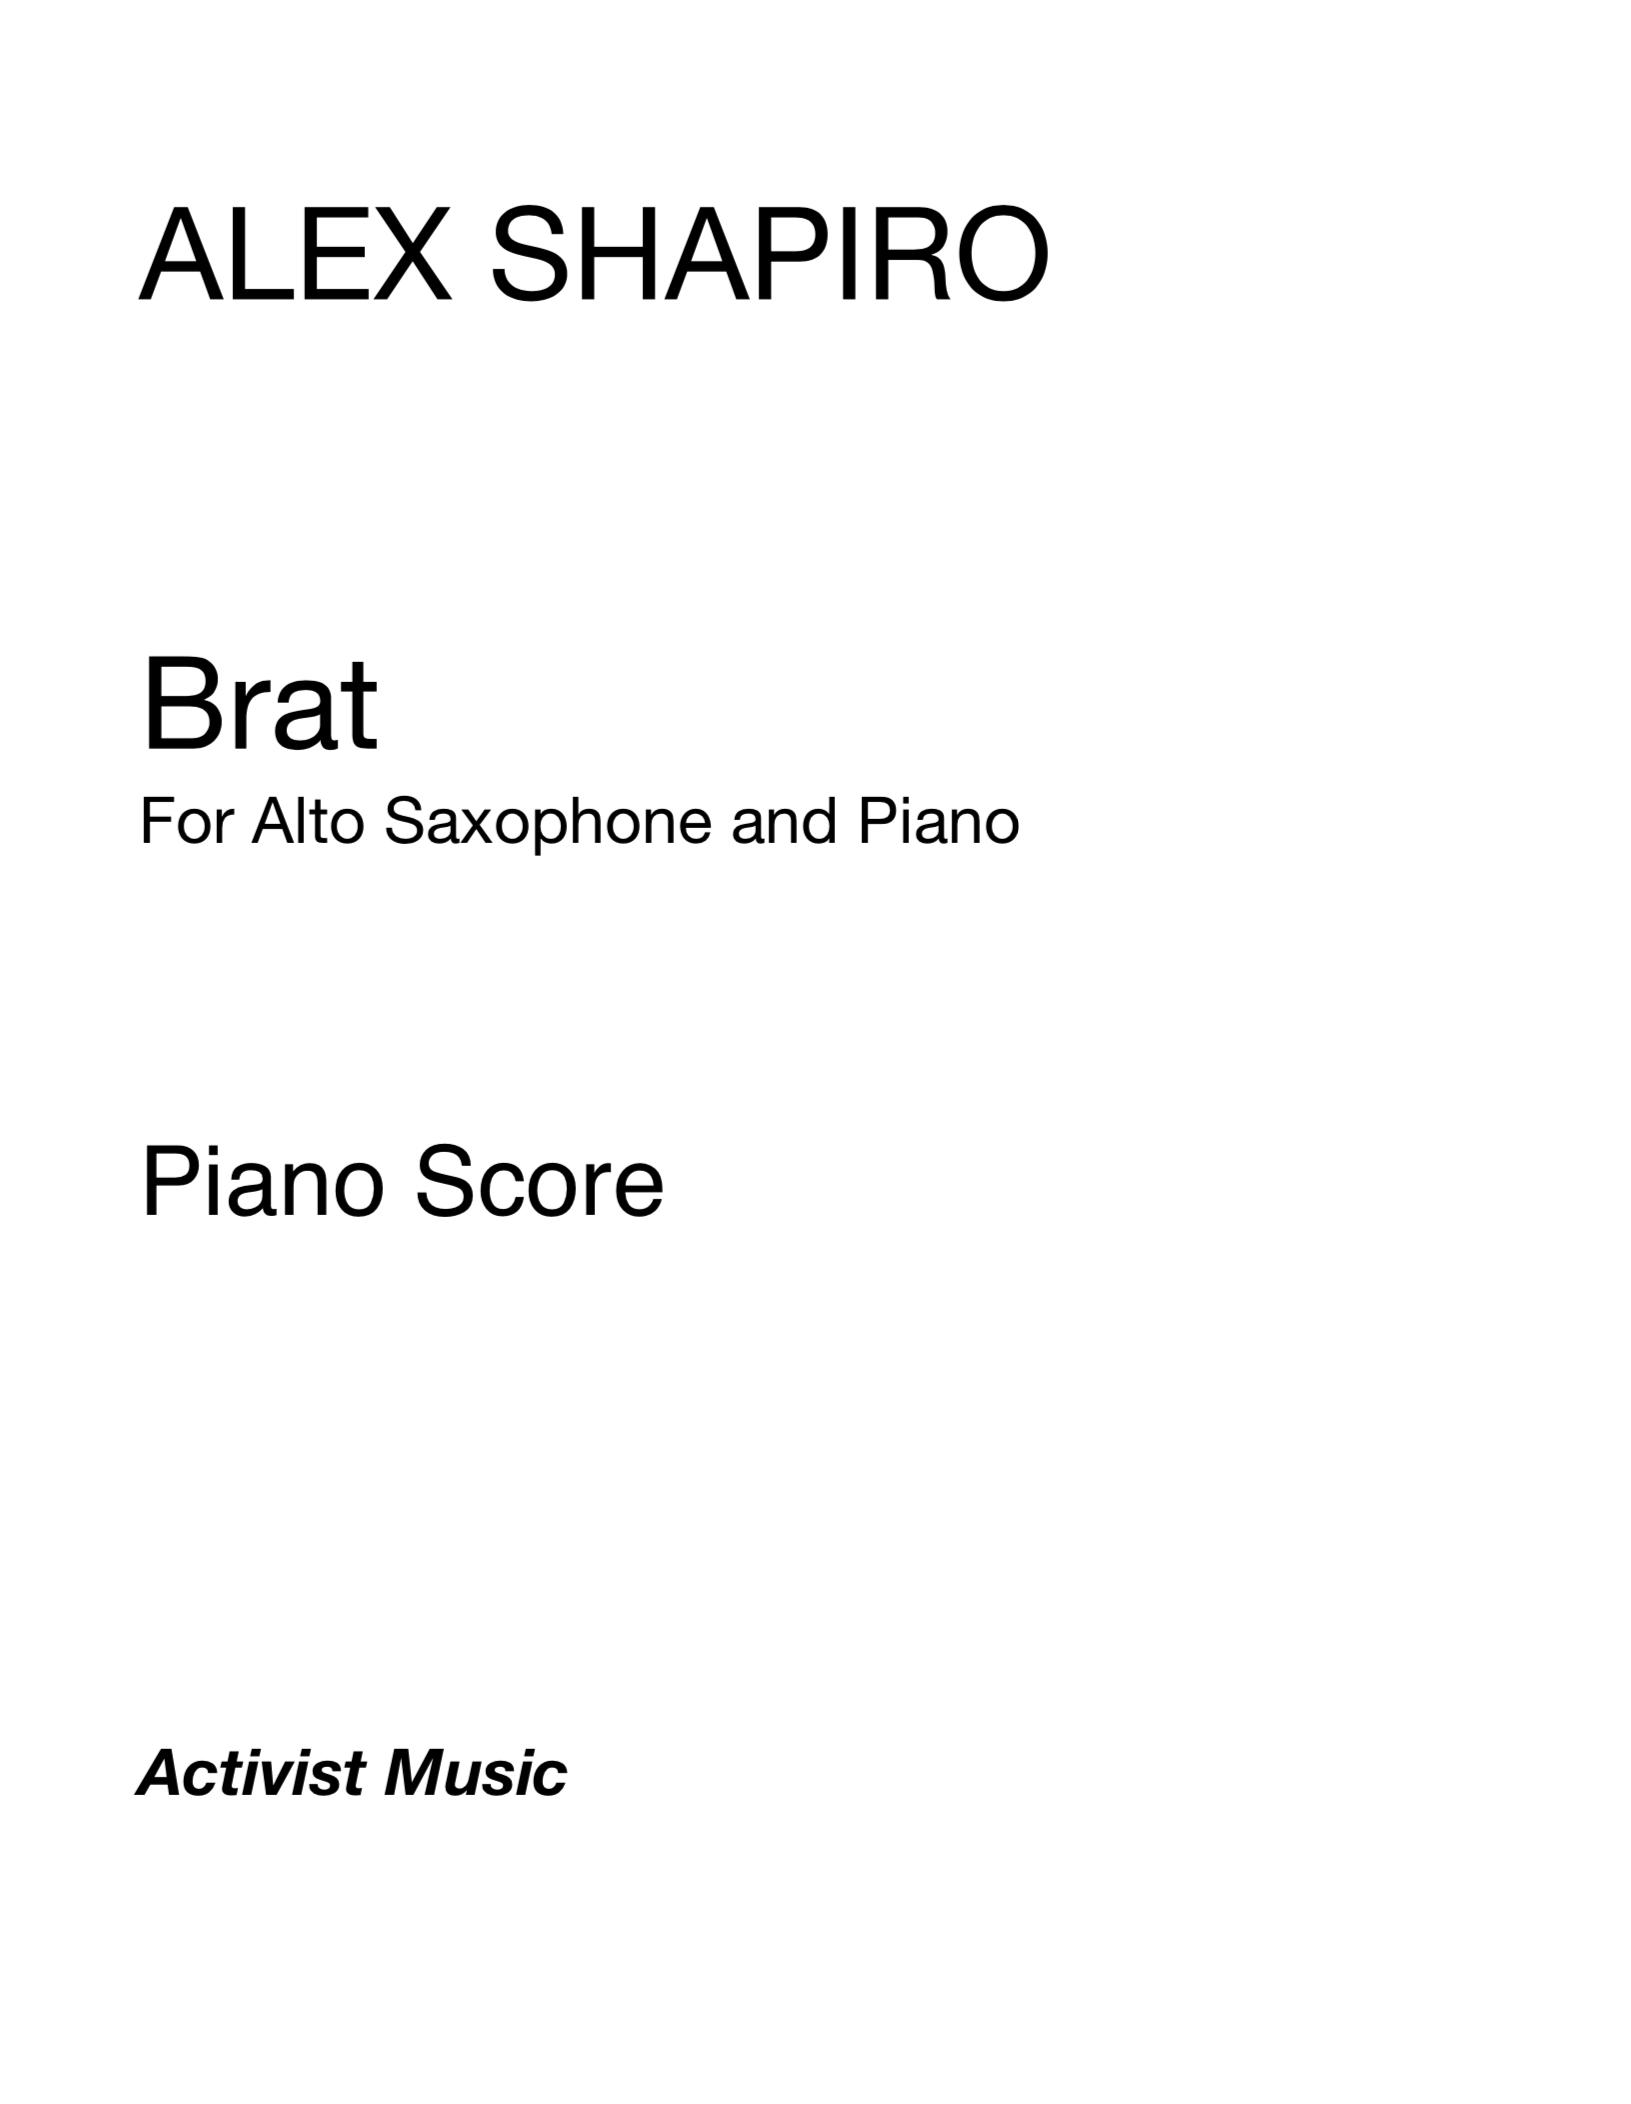 Brat by Alex Shapiro